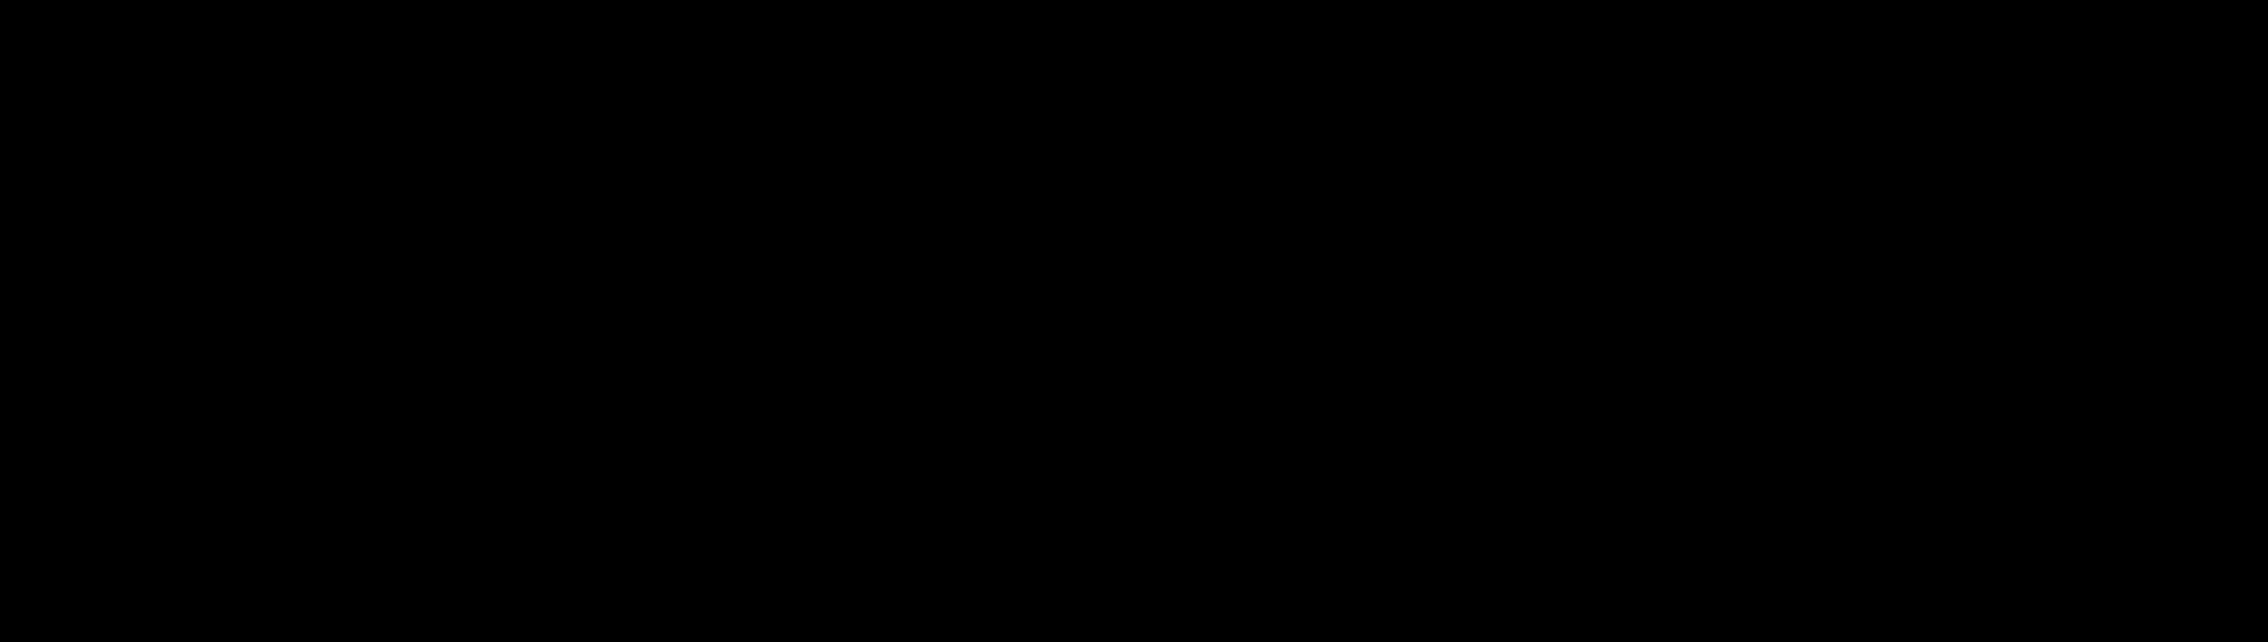 Ecliptic Software